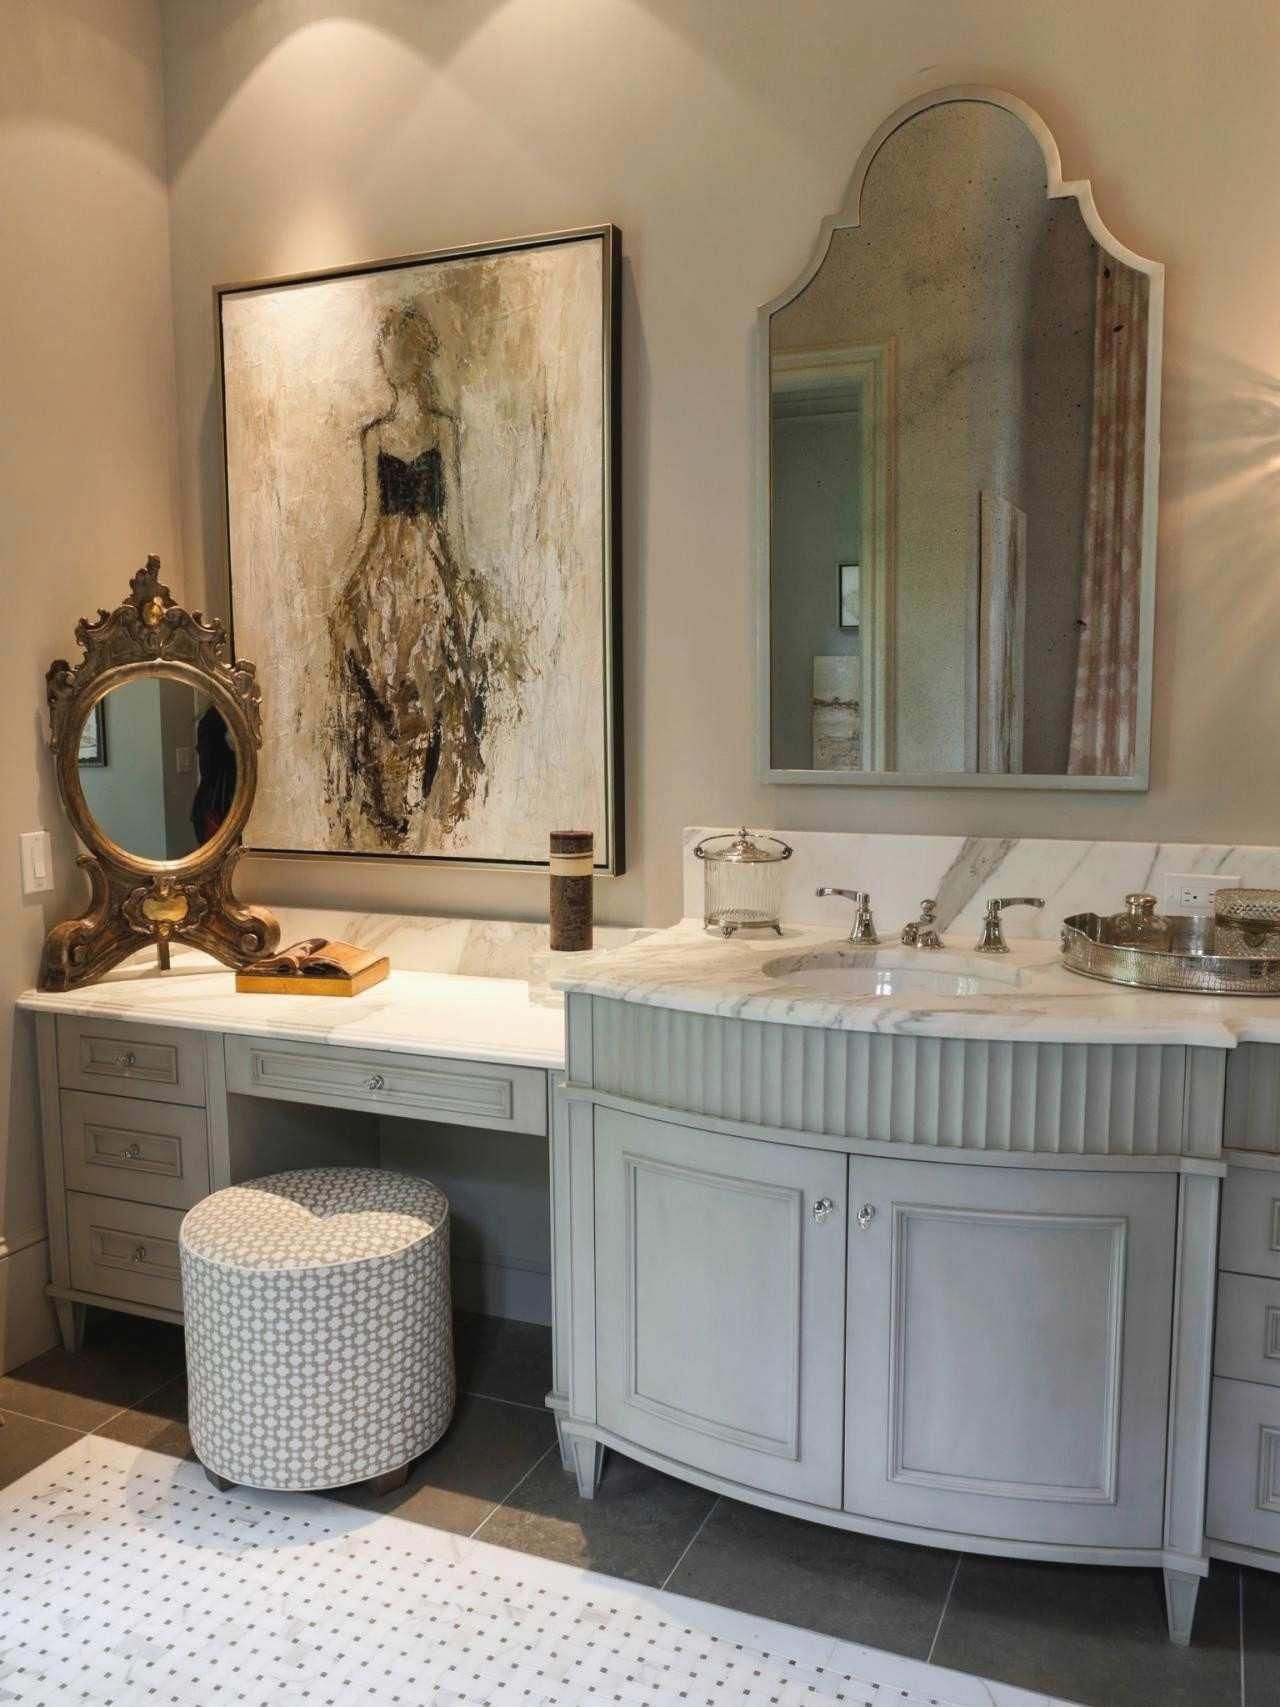 Bathroom Wall Art Canvas Frenchcountrybathrooms Black And White Tiles Bathroom White Bathroom Tiles Glamorous Bathroom Decor